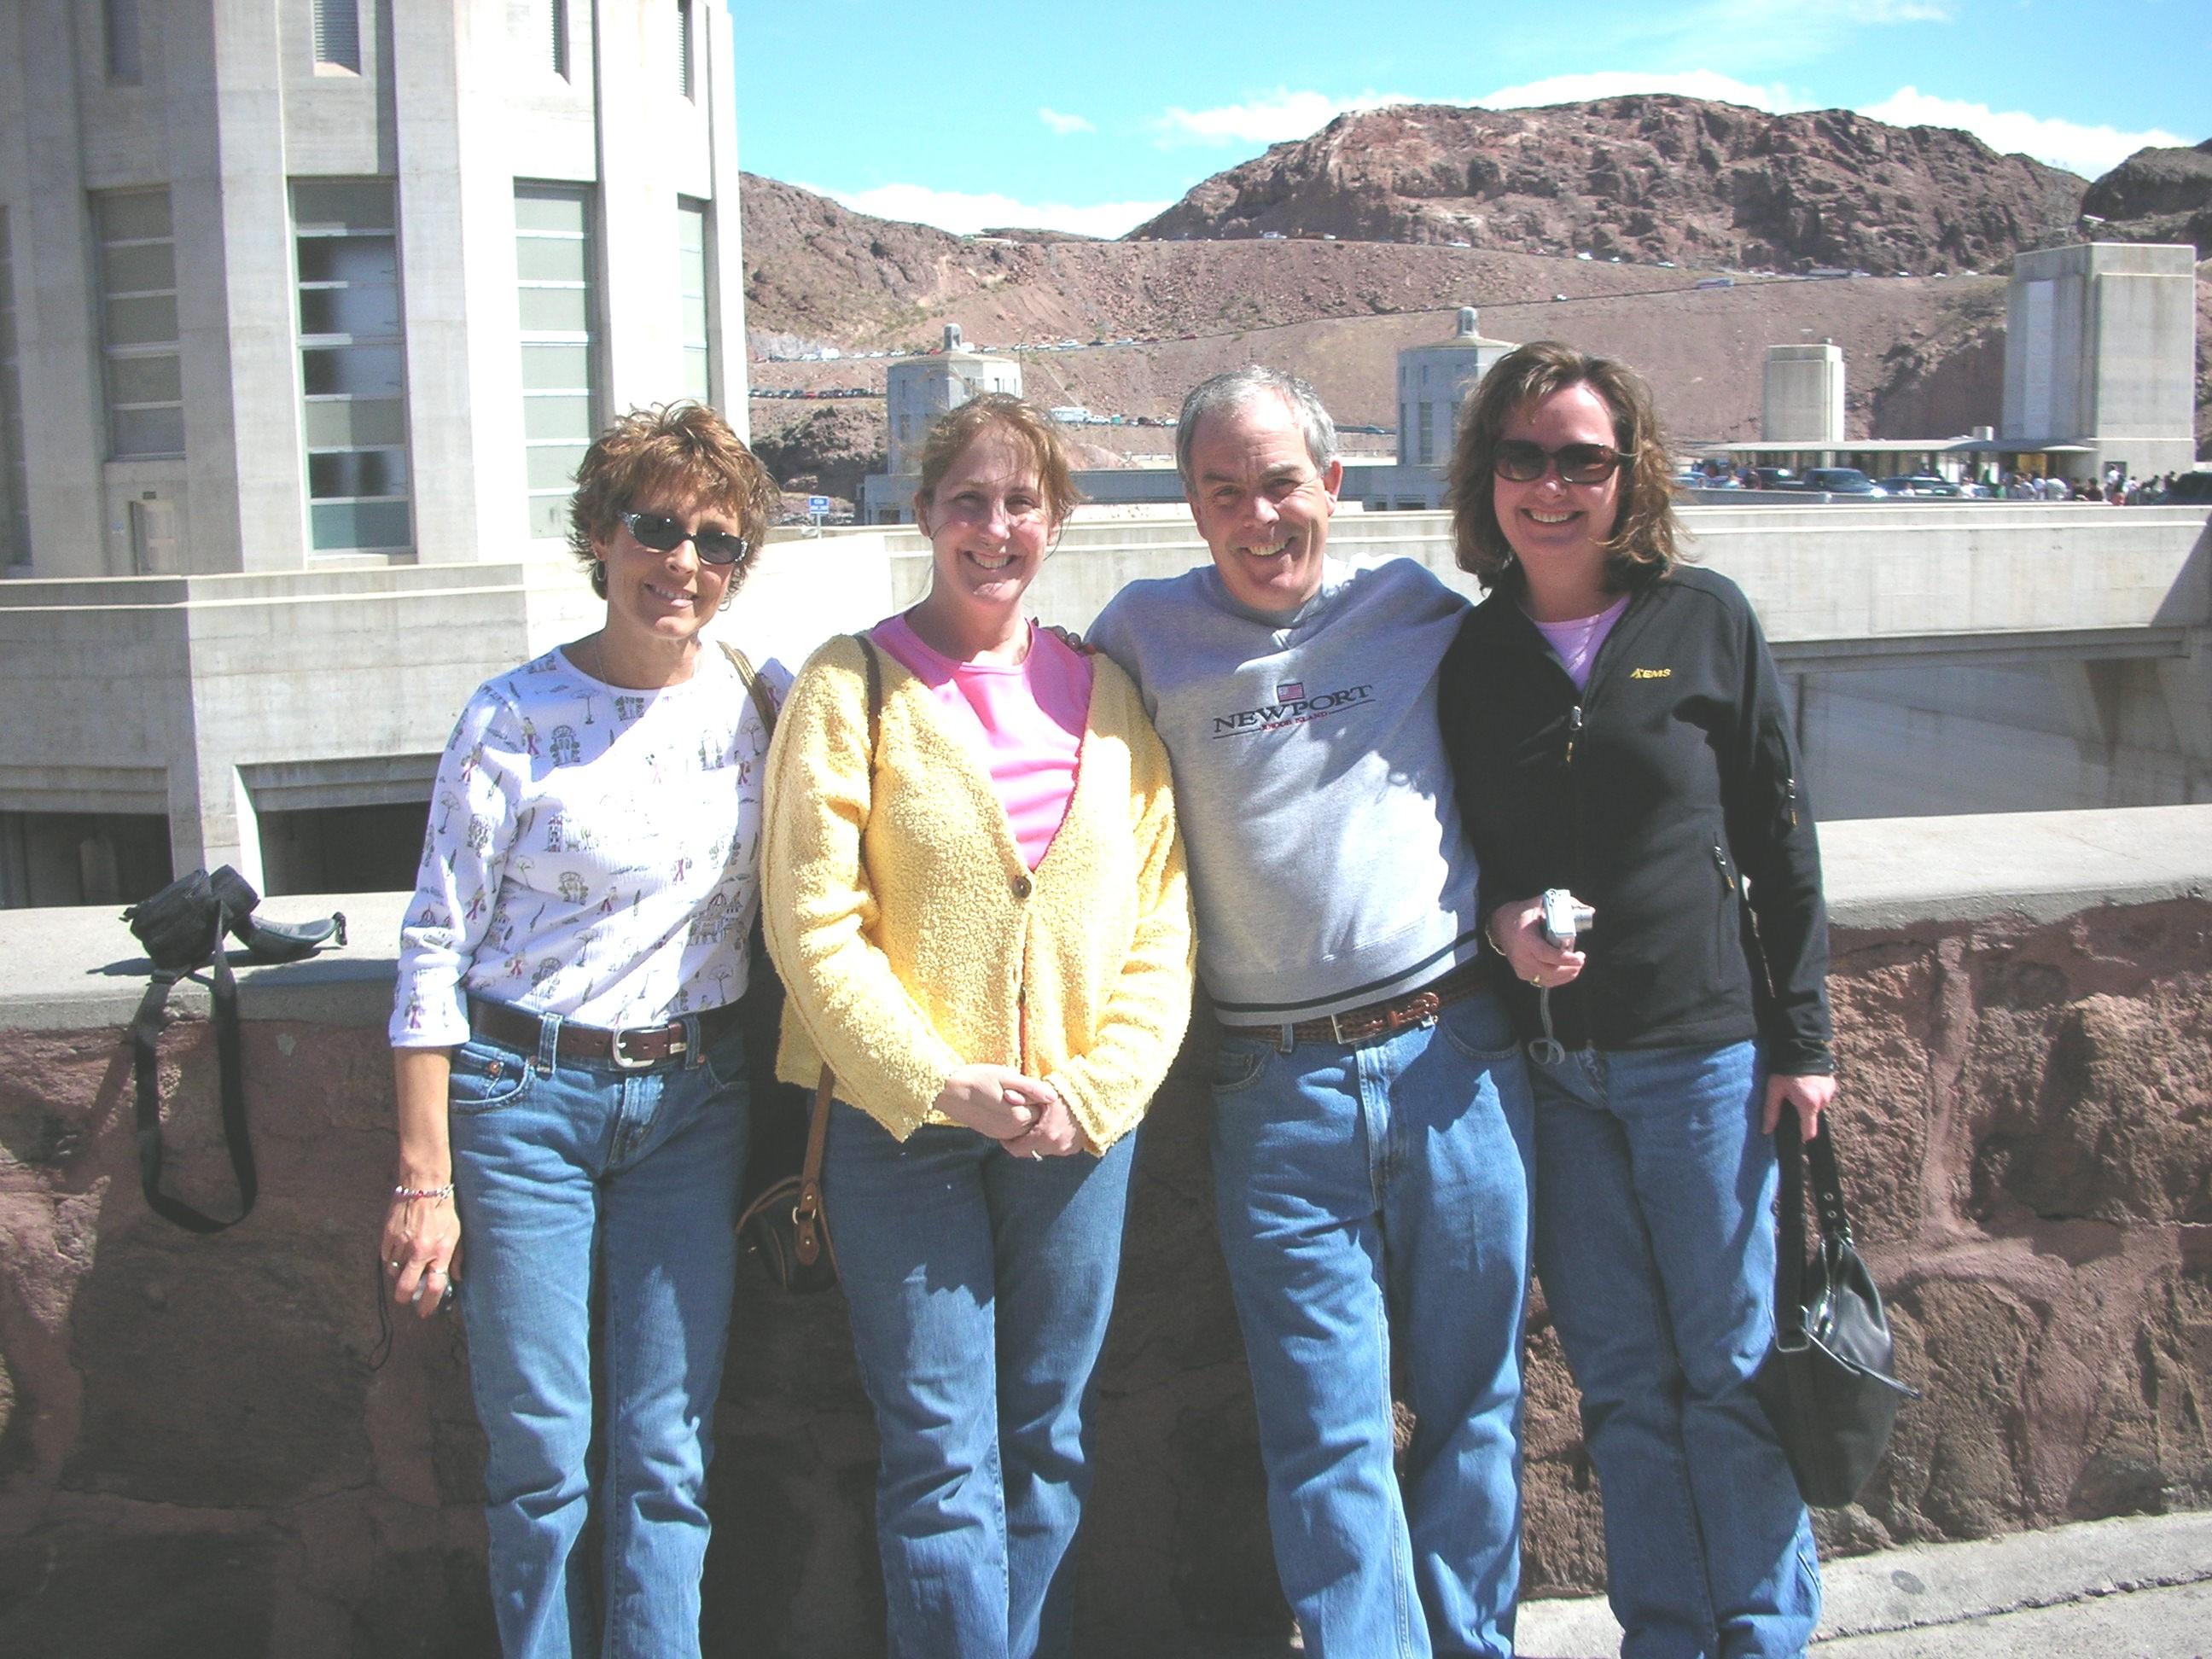 Sally, Donna, Frank & Karen